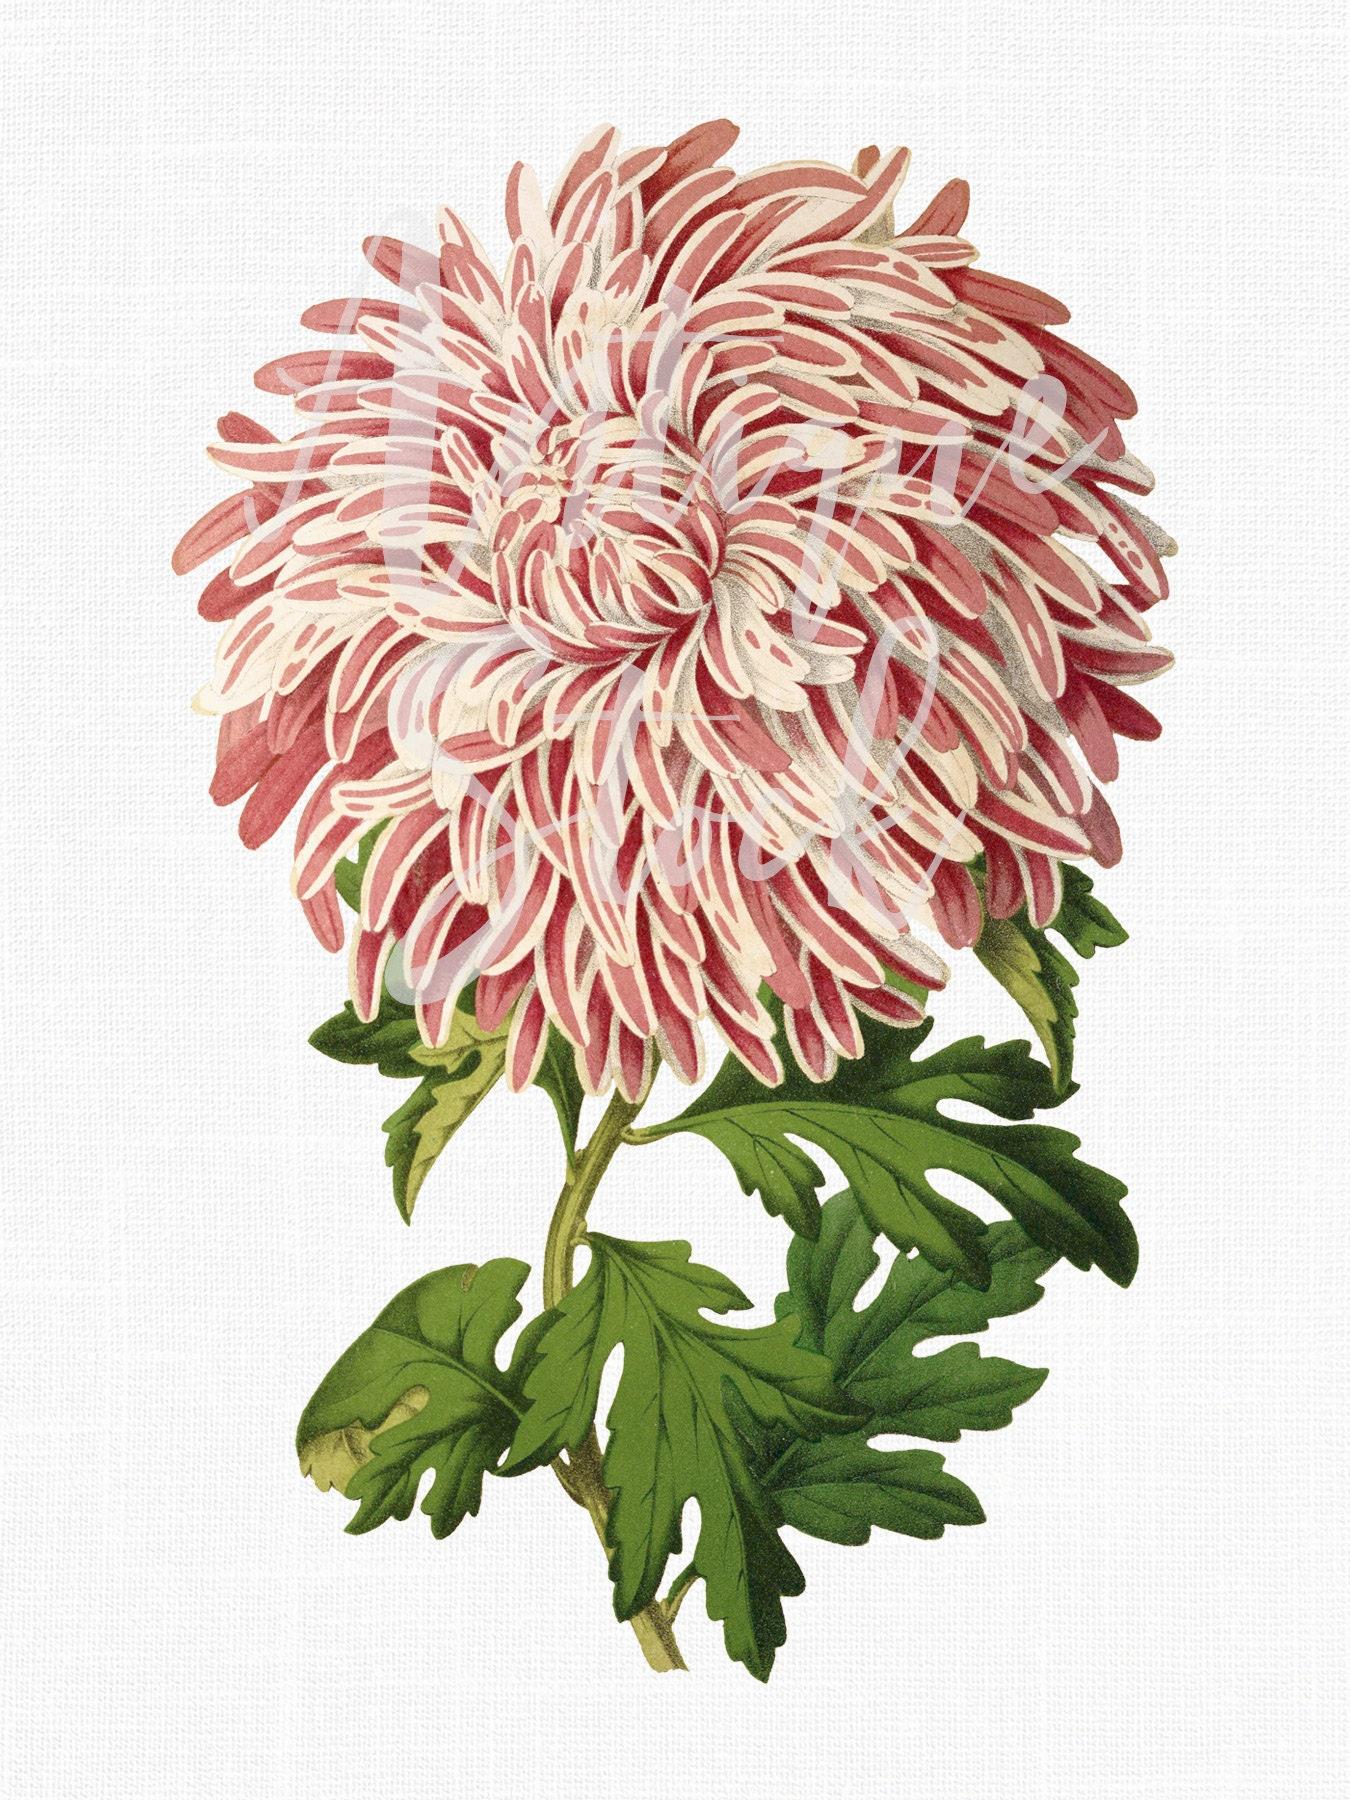 Chrysanthemum flower florists daisy instant etsy zoom izmirmasajfo